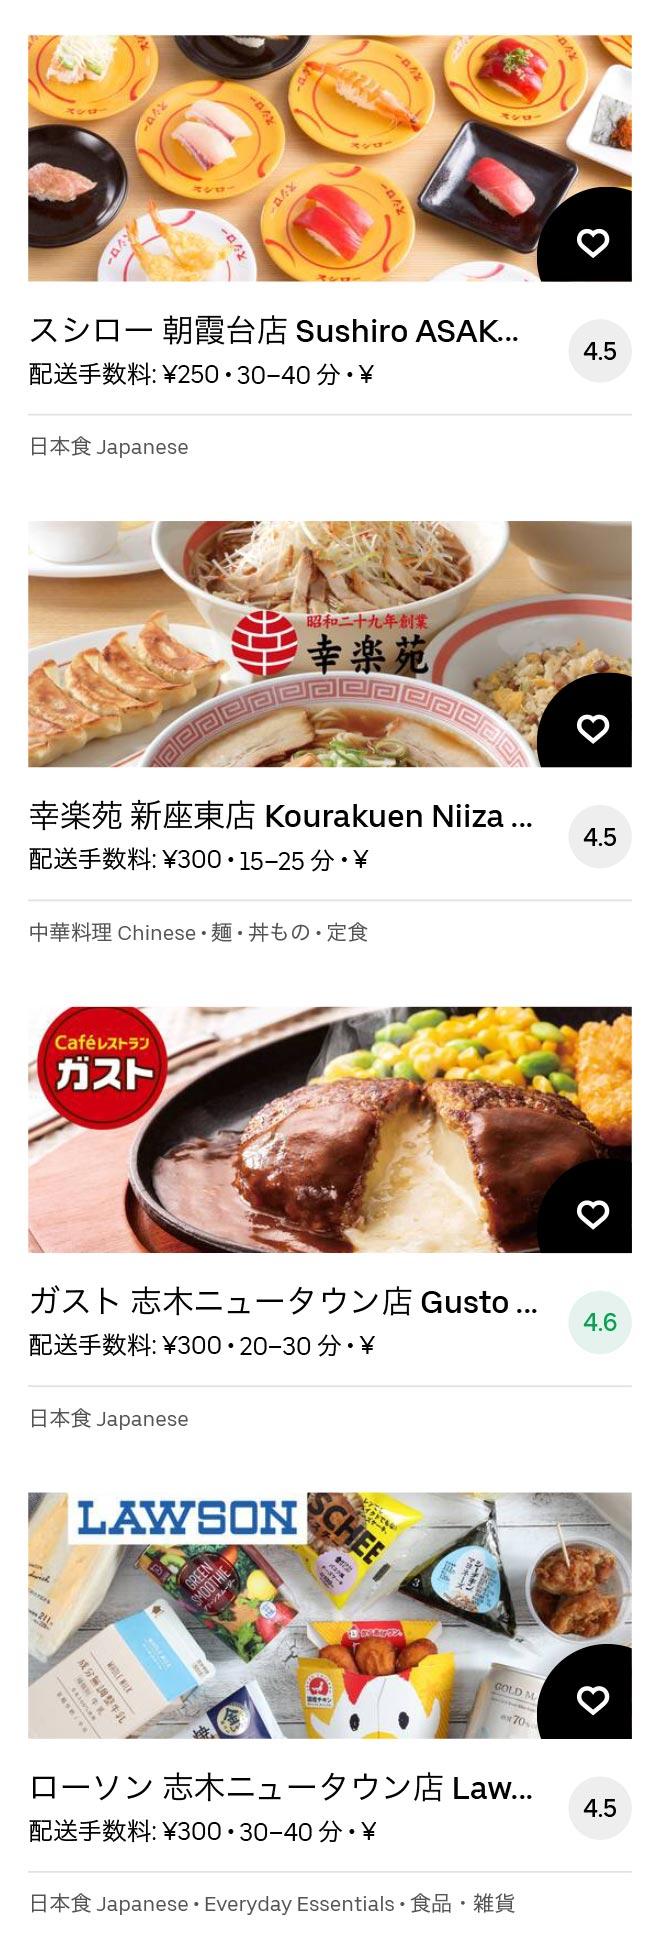 Niiza menu 2011 06